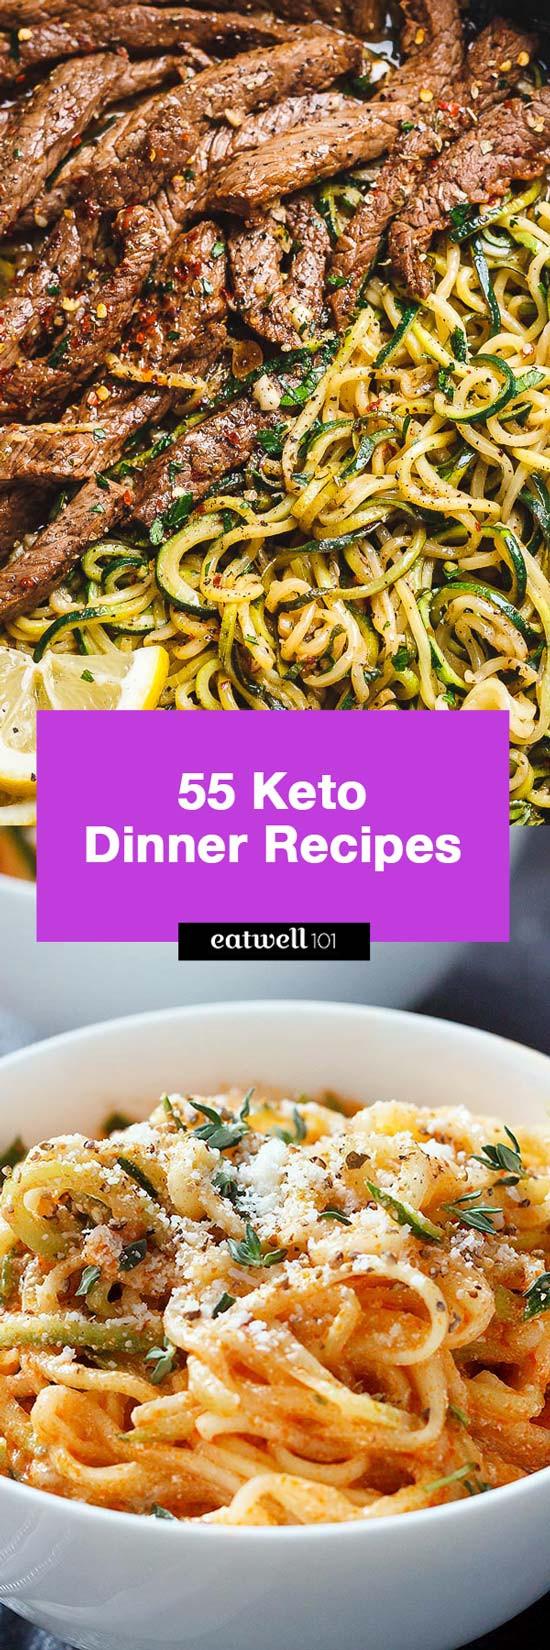 Keto Dinner Recipe  Easy Keto Dinner Recipes – 65 Quick Recipe ideas for Keto